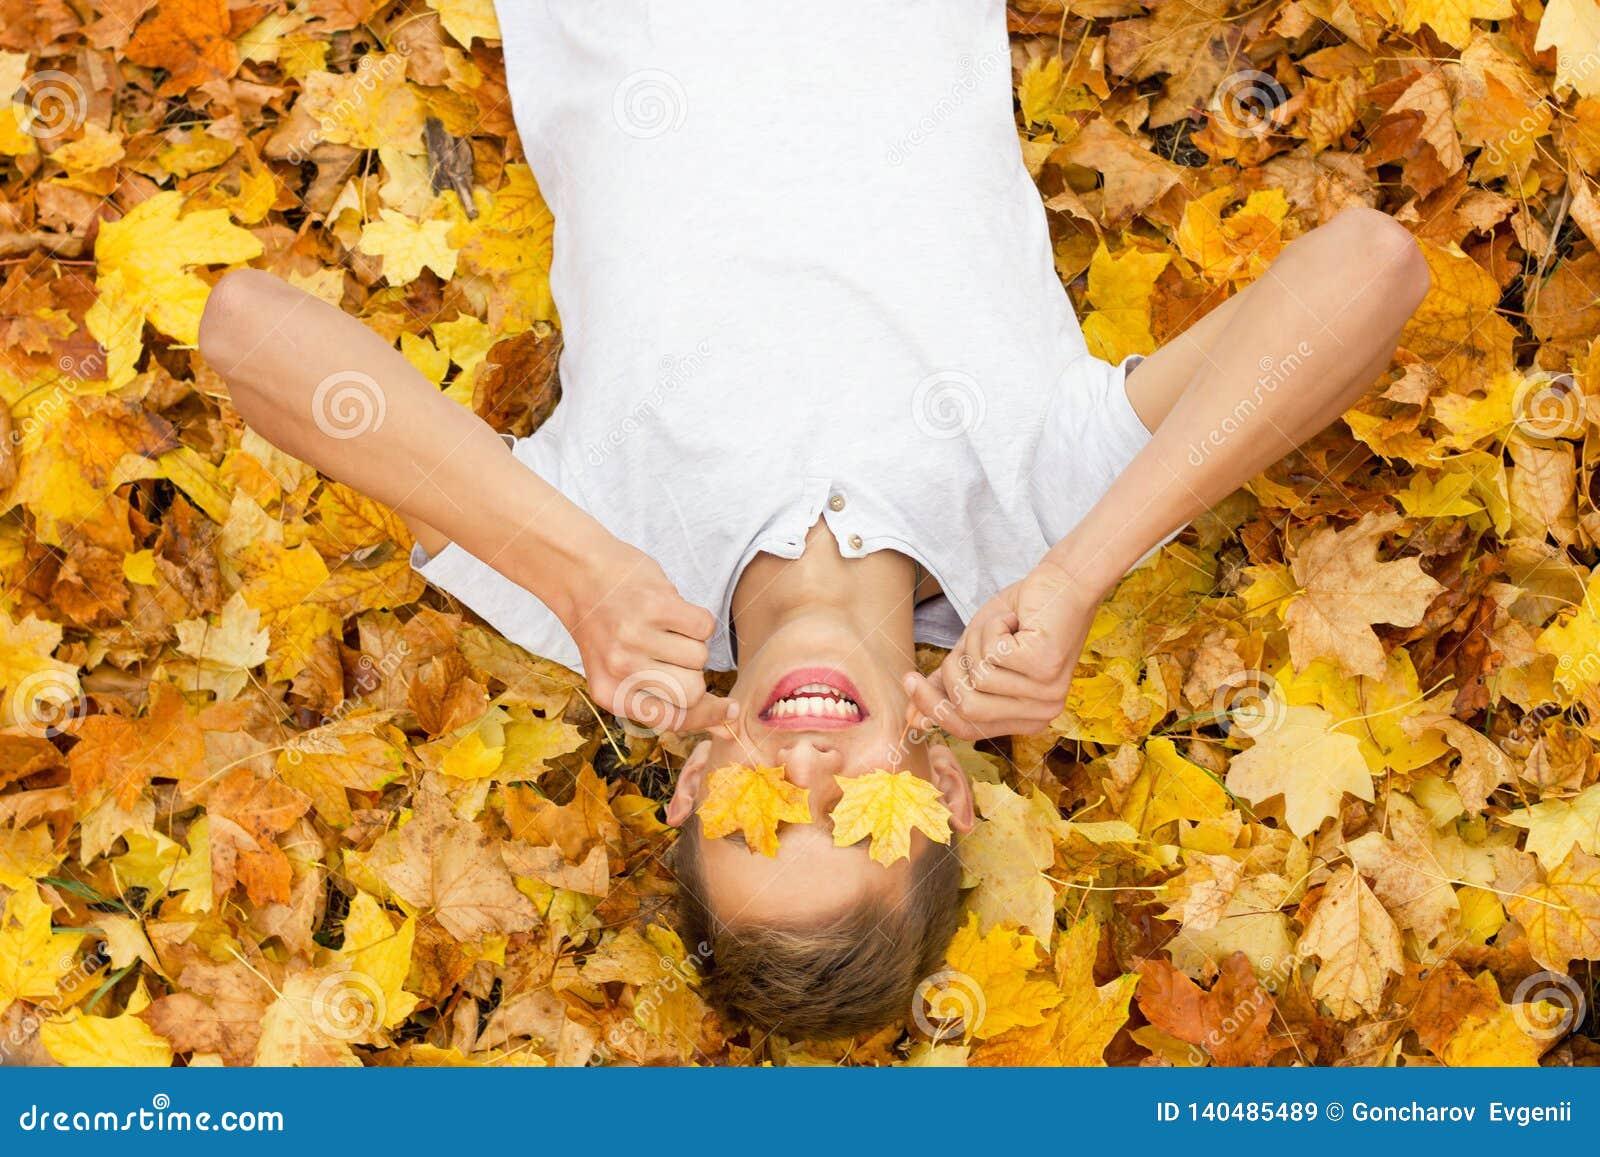 Boy in autumn leaves ,